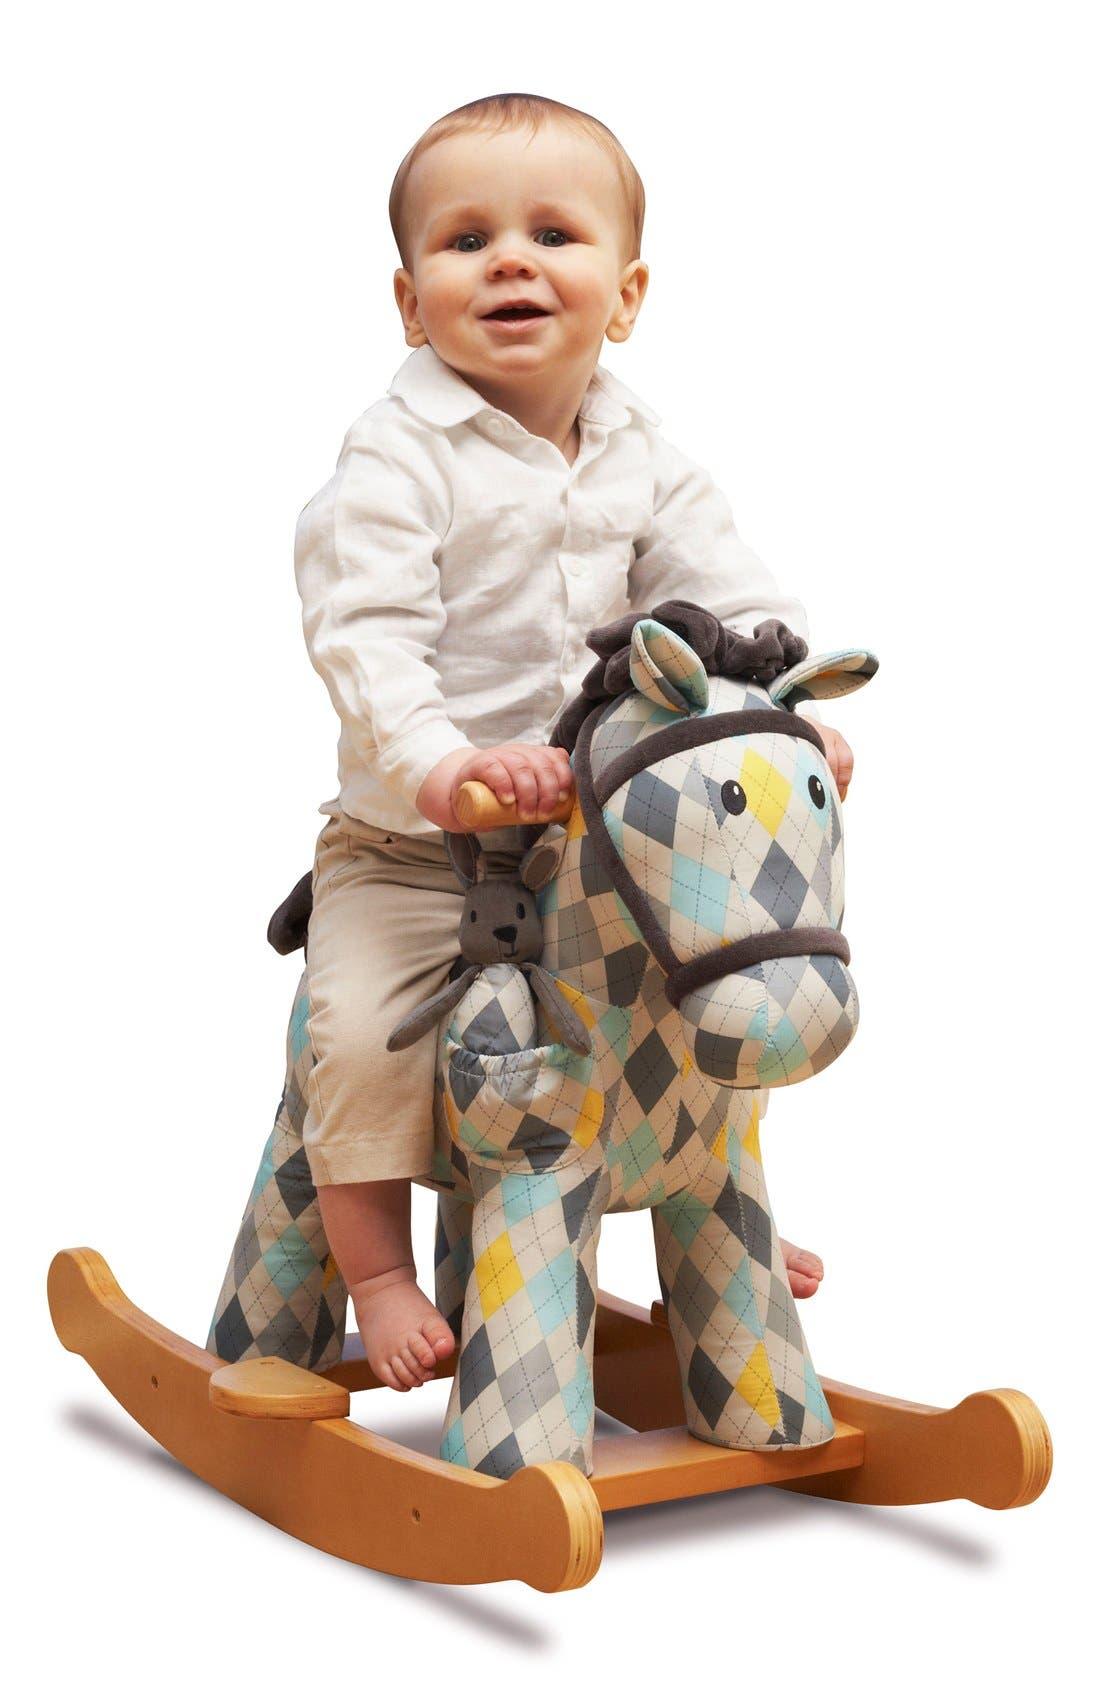 Lewis & Fitz Rocking Horse & Stuffed Animal,                             Alternate thumbnail 4, color,                             400